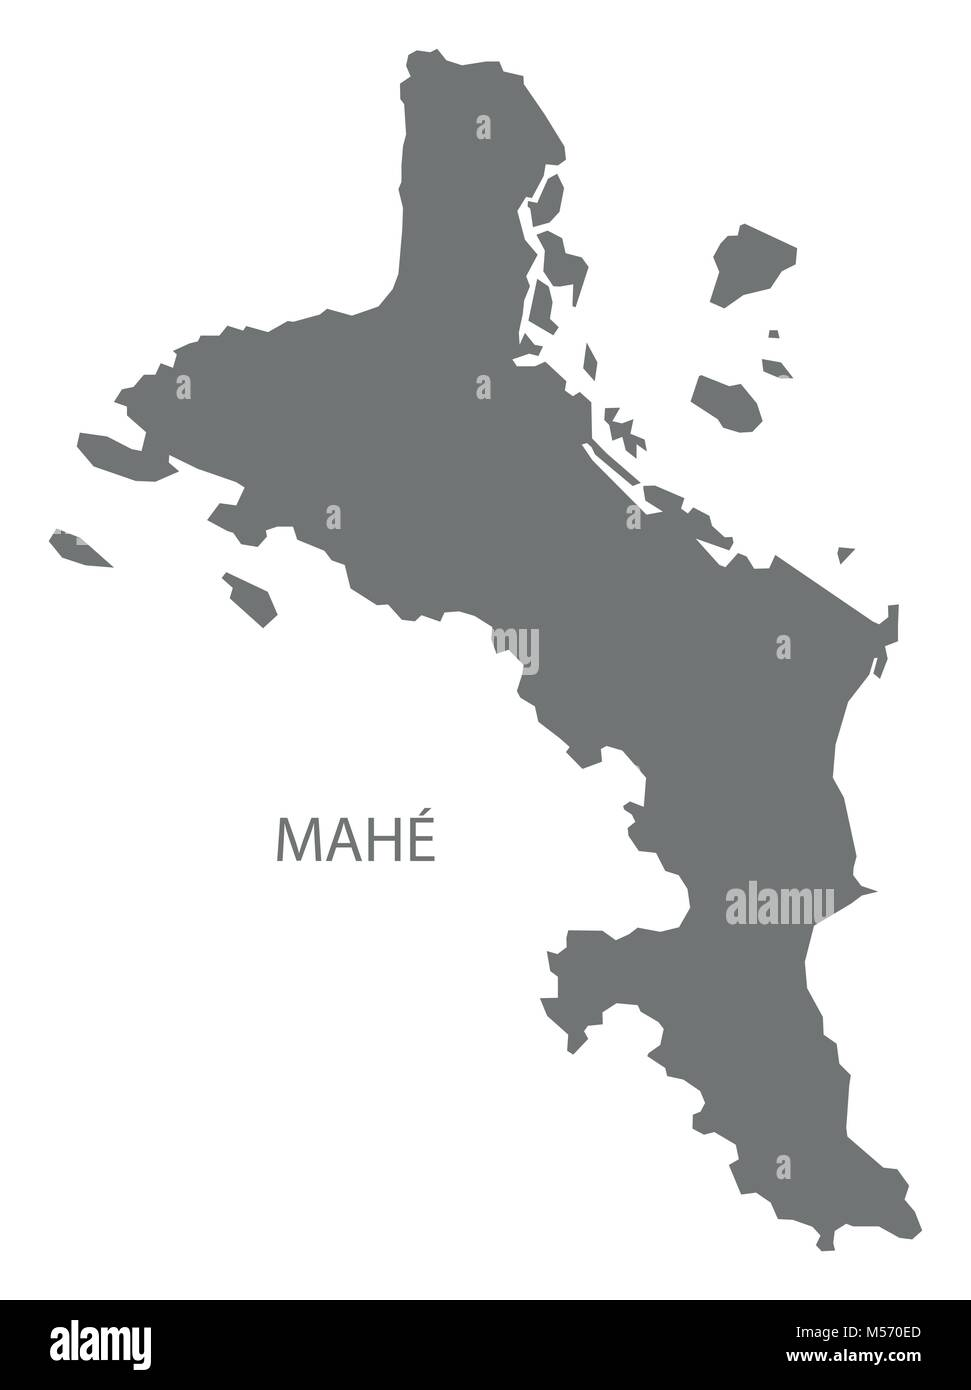 Karte Seychellen.Mahe Seychellen Karte Grau Abbildung Silhouette Vektor